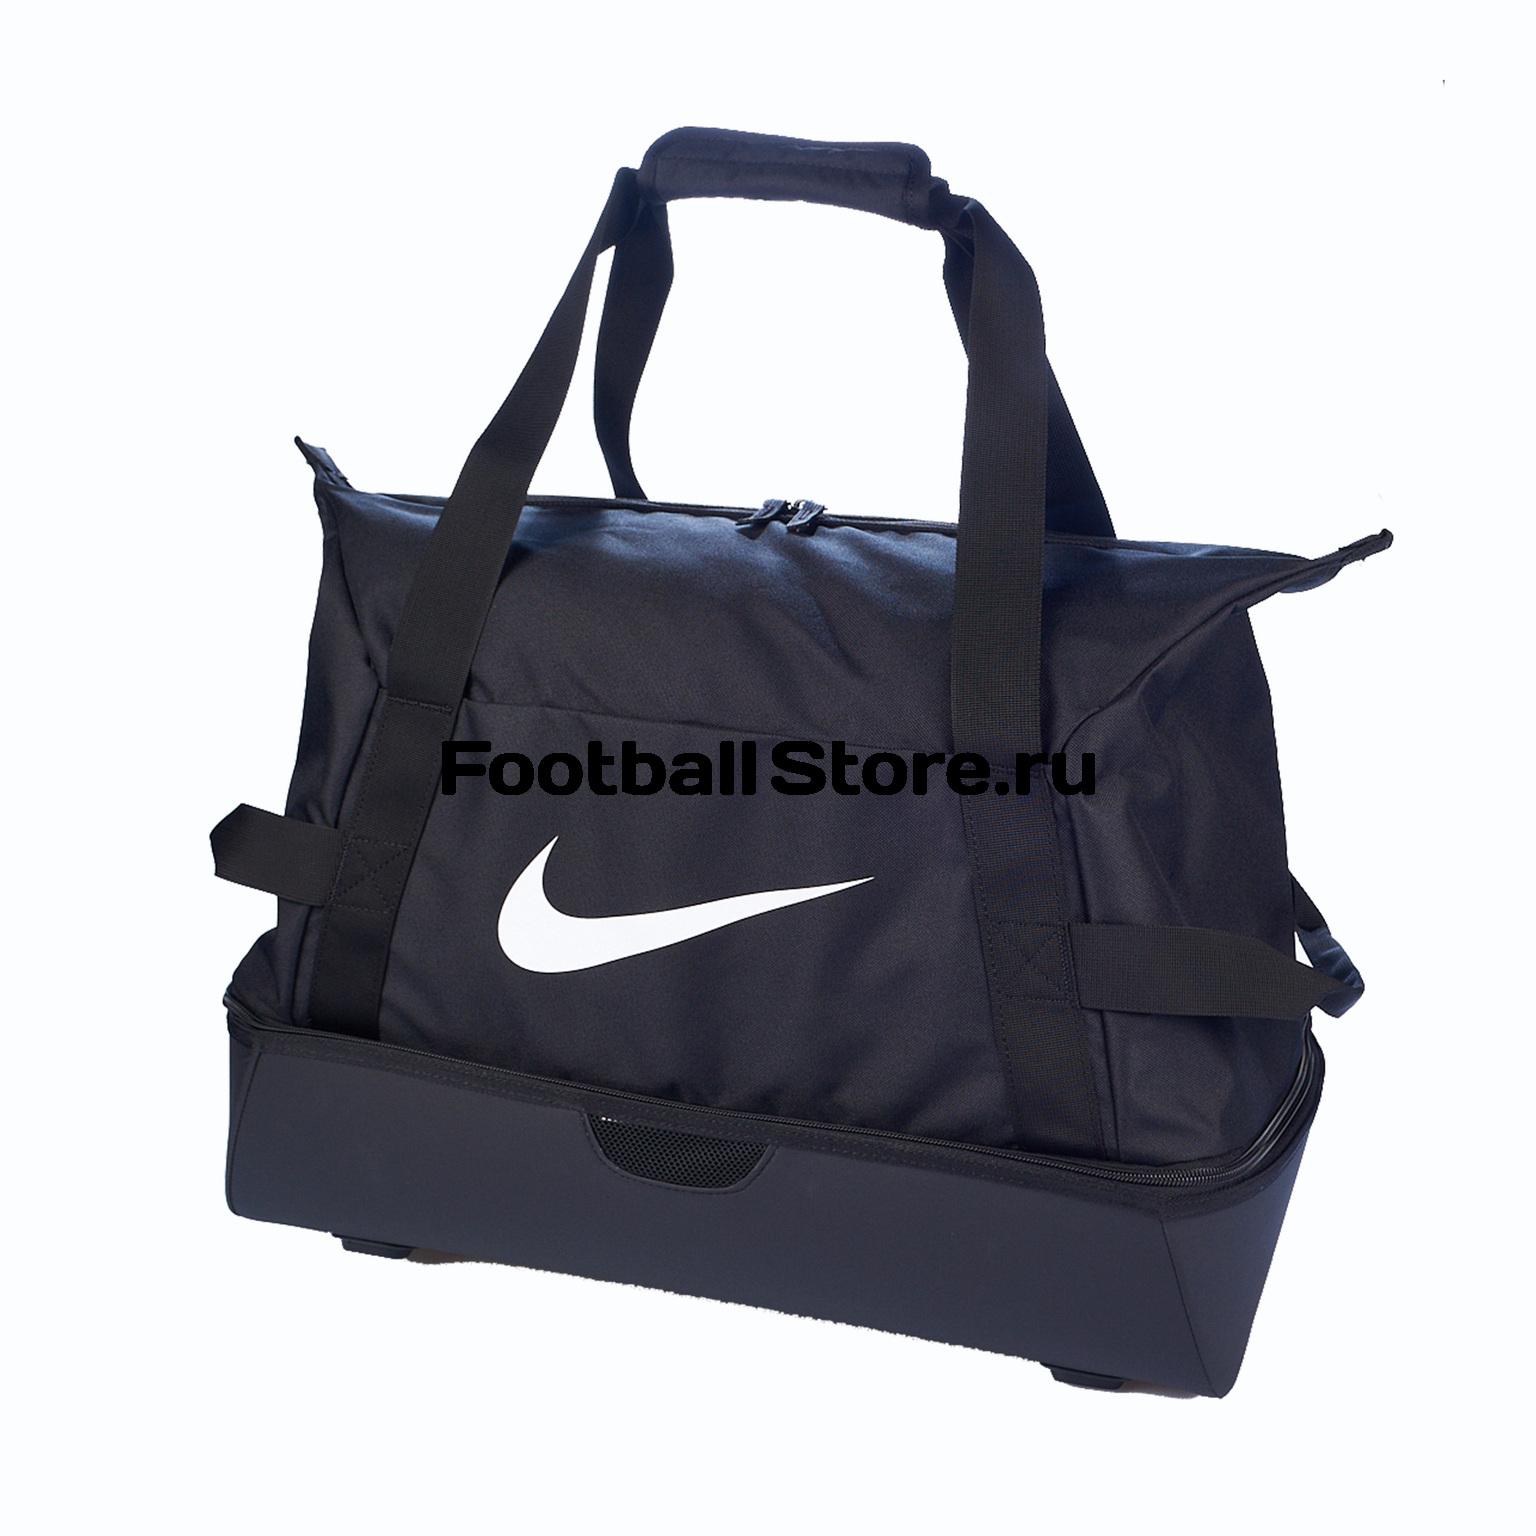 Сумка Nike Academy Team L HDCS BA5506-010 сумка nike academy team l ba5506 410